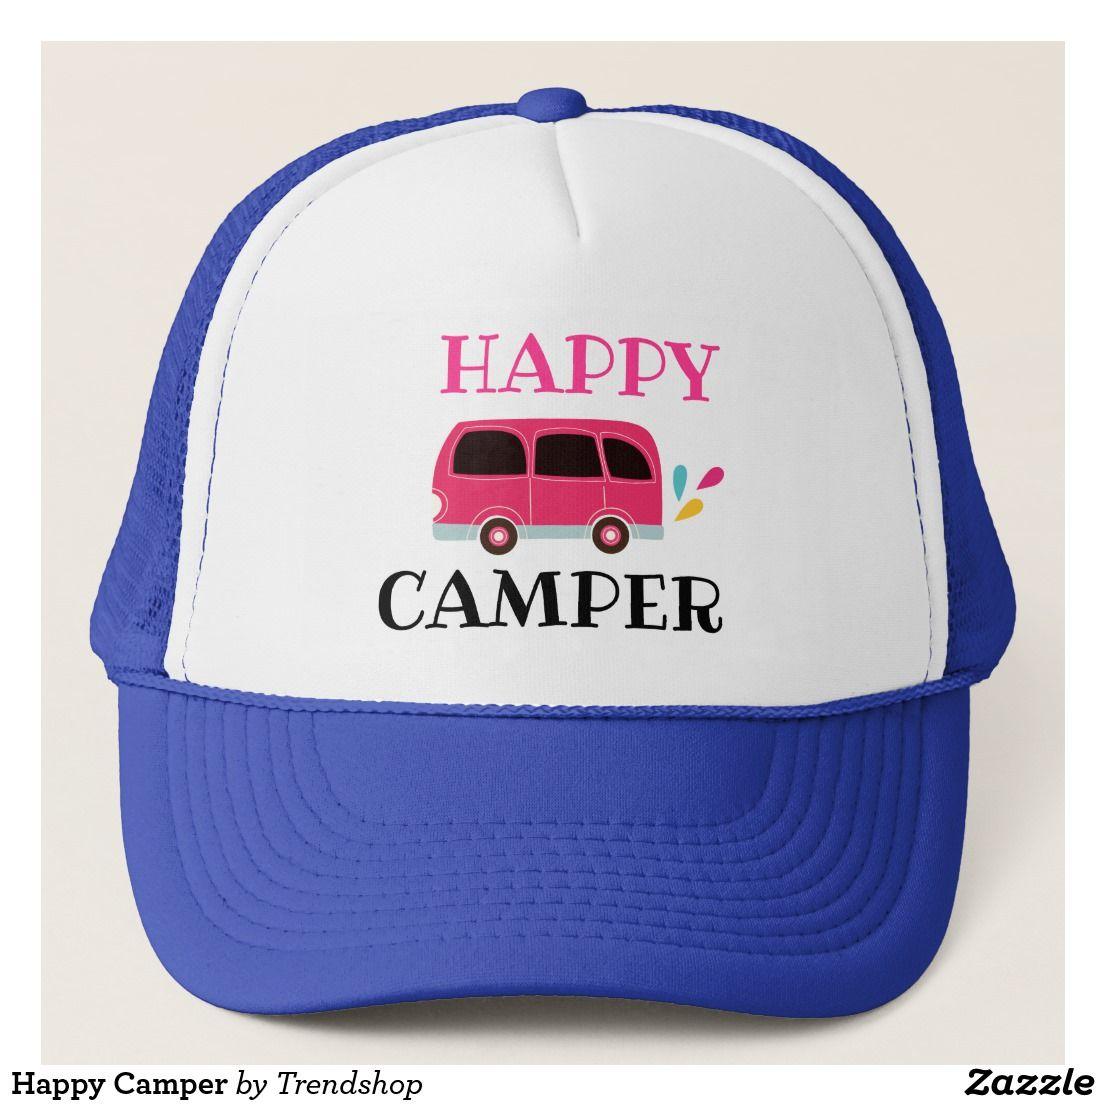 Cartoon Corn Mesh Caps Adjustable Unisex Snapback Trucker Cap